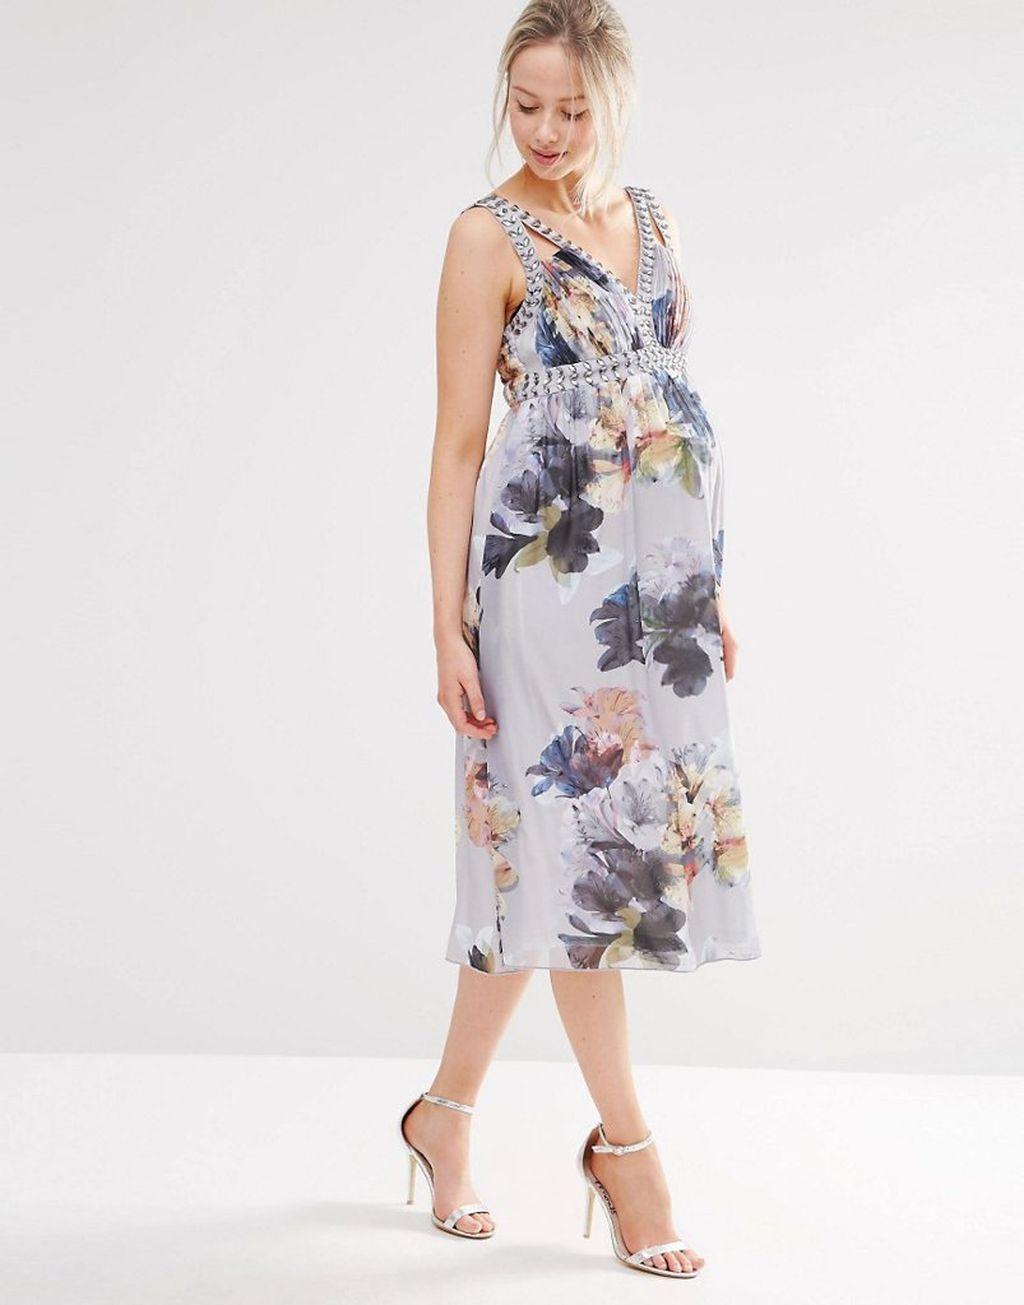 Wedding guest dress ideas   Beautiful Maternity Dress Ideas For Wedding Guest  Dresses